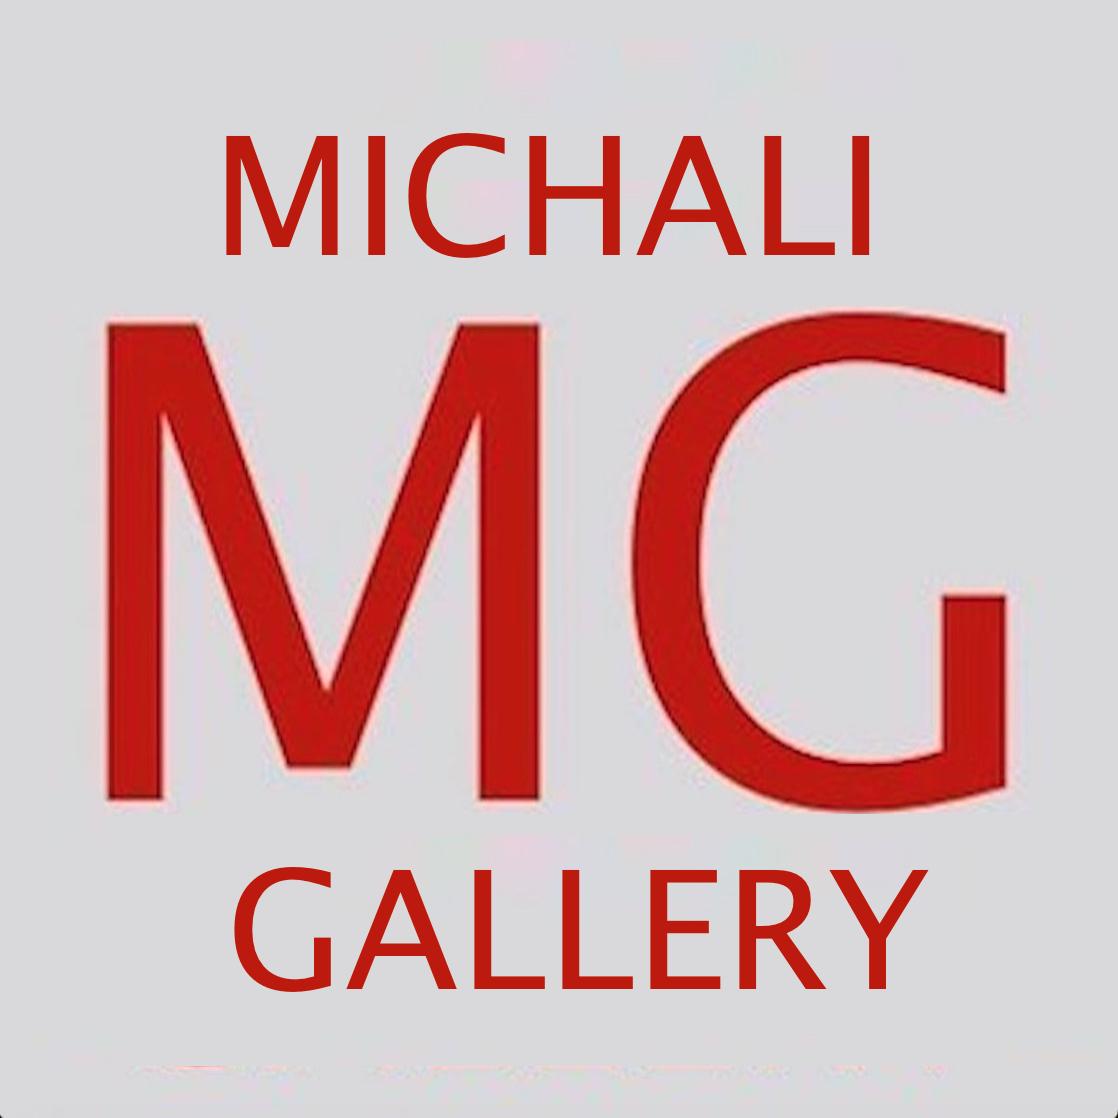 MICHALI GALLERY